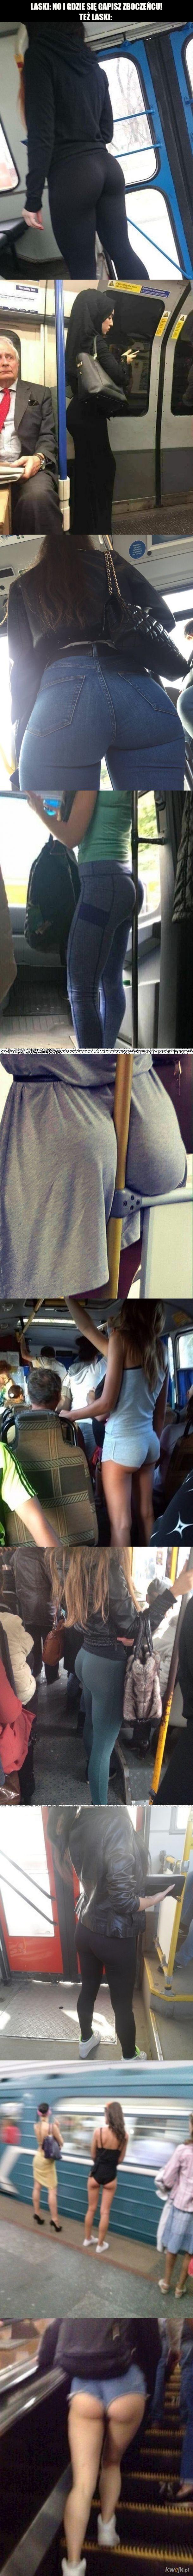 Transport publiczny (d♦py)